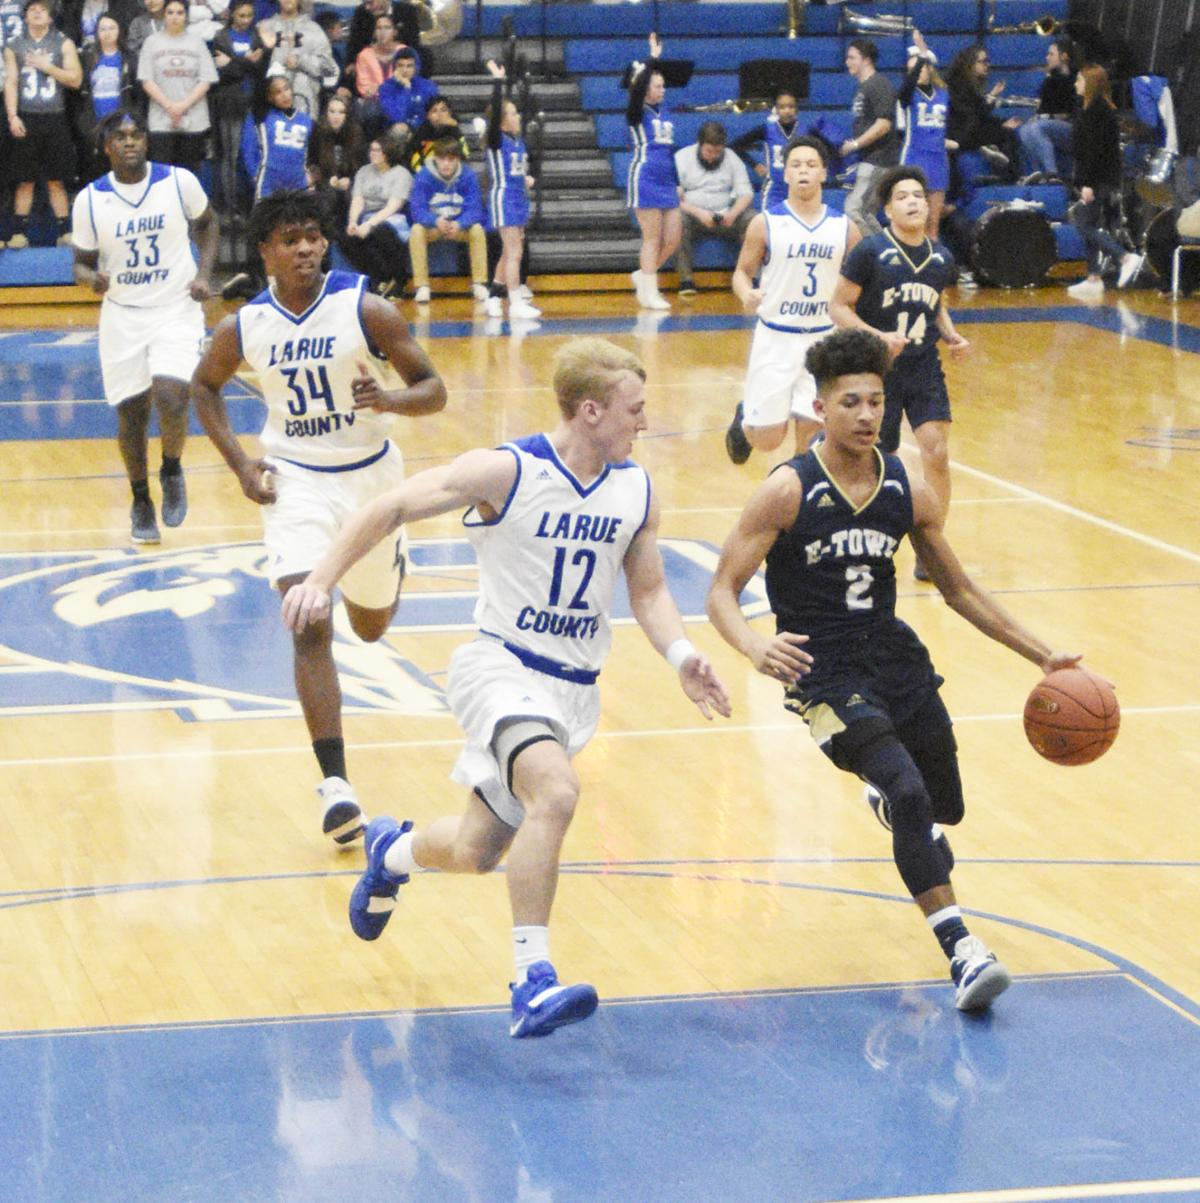 BOYS' PREP BASKETBALL: Hawks pull away to beat E'town